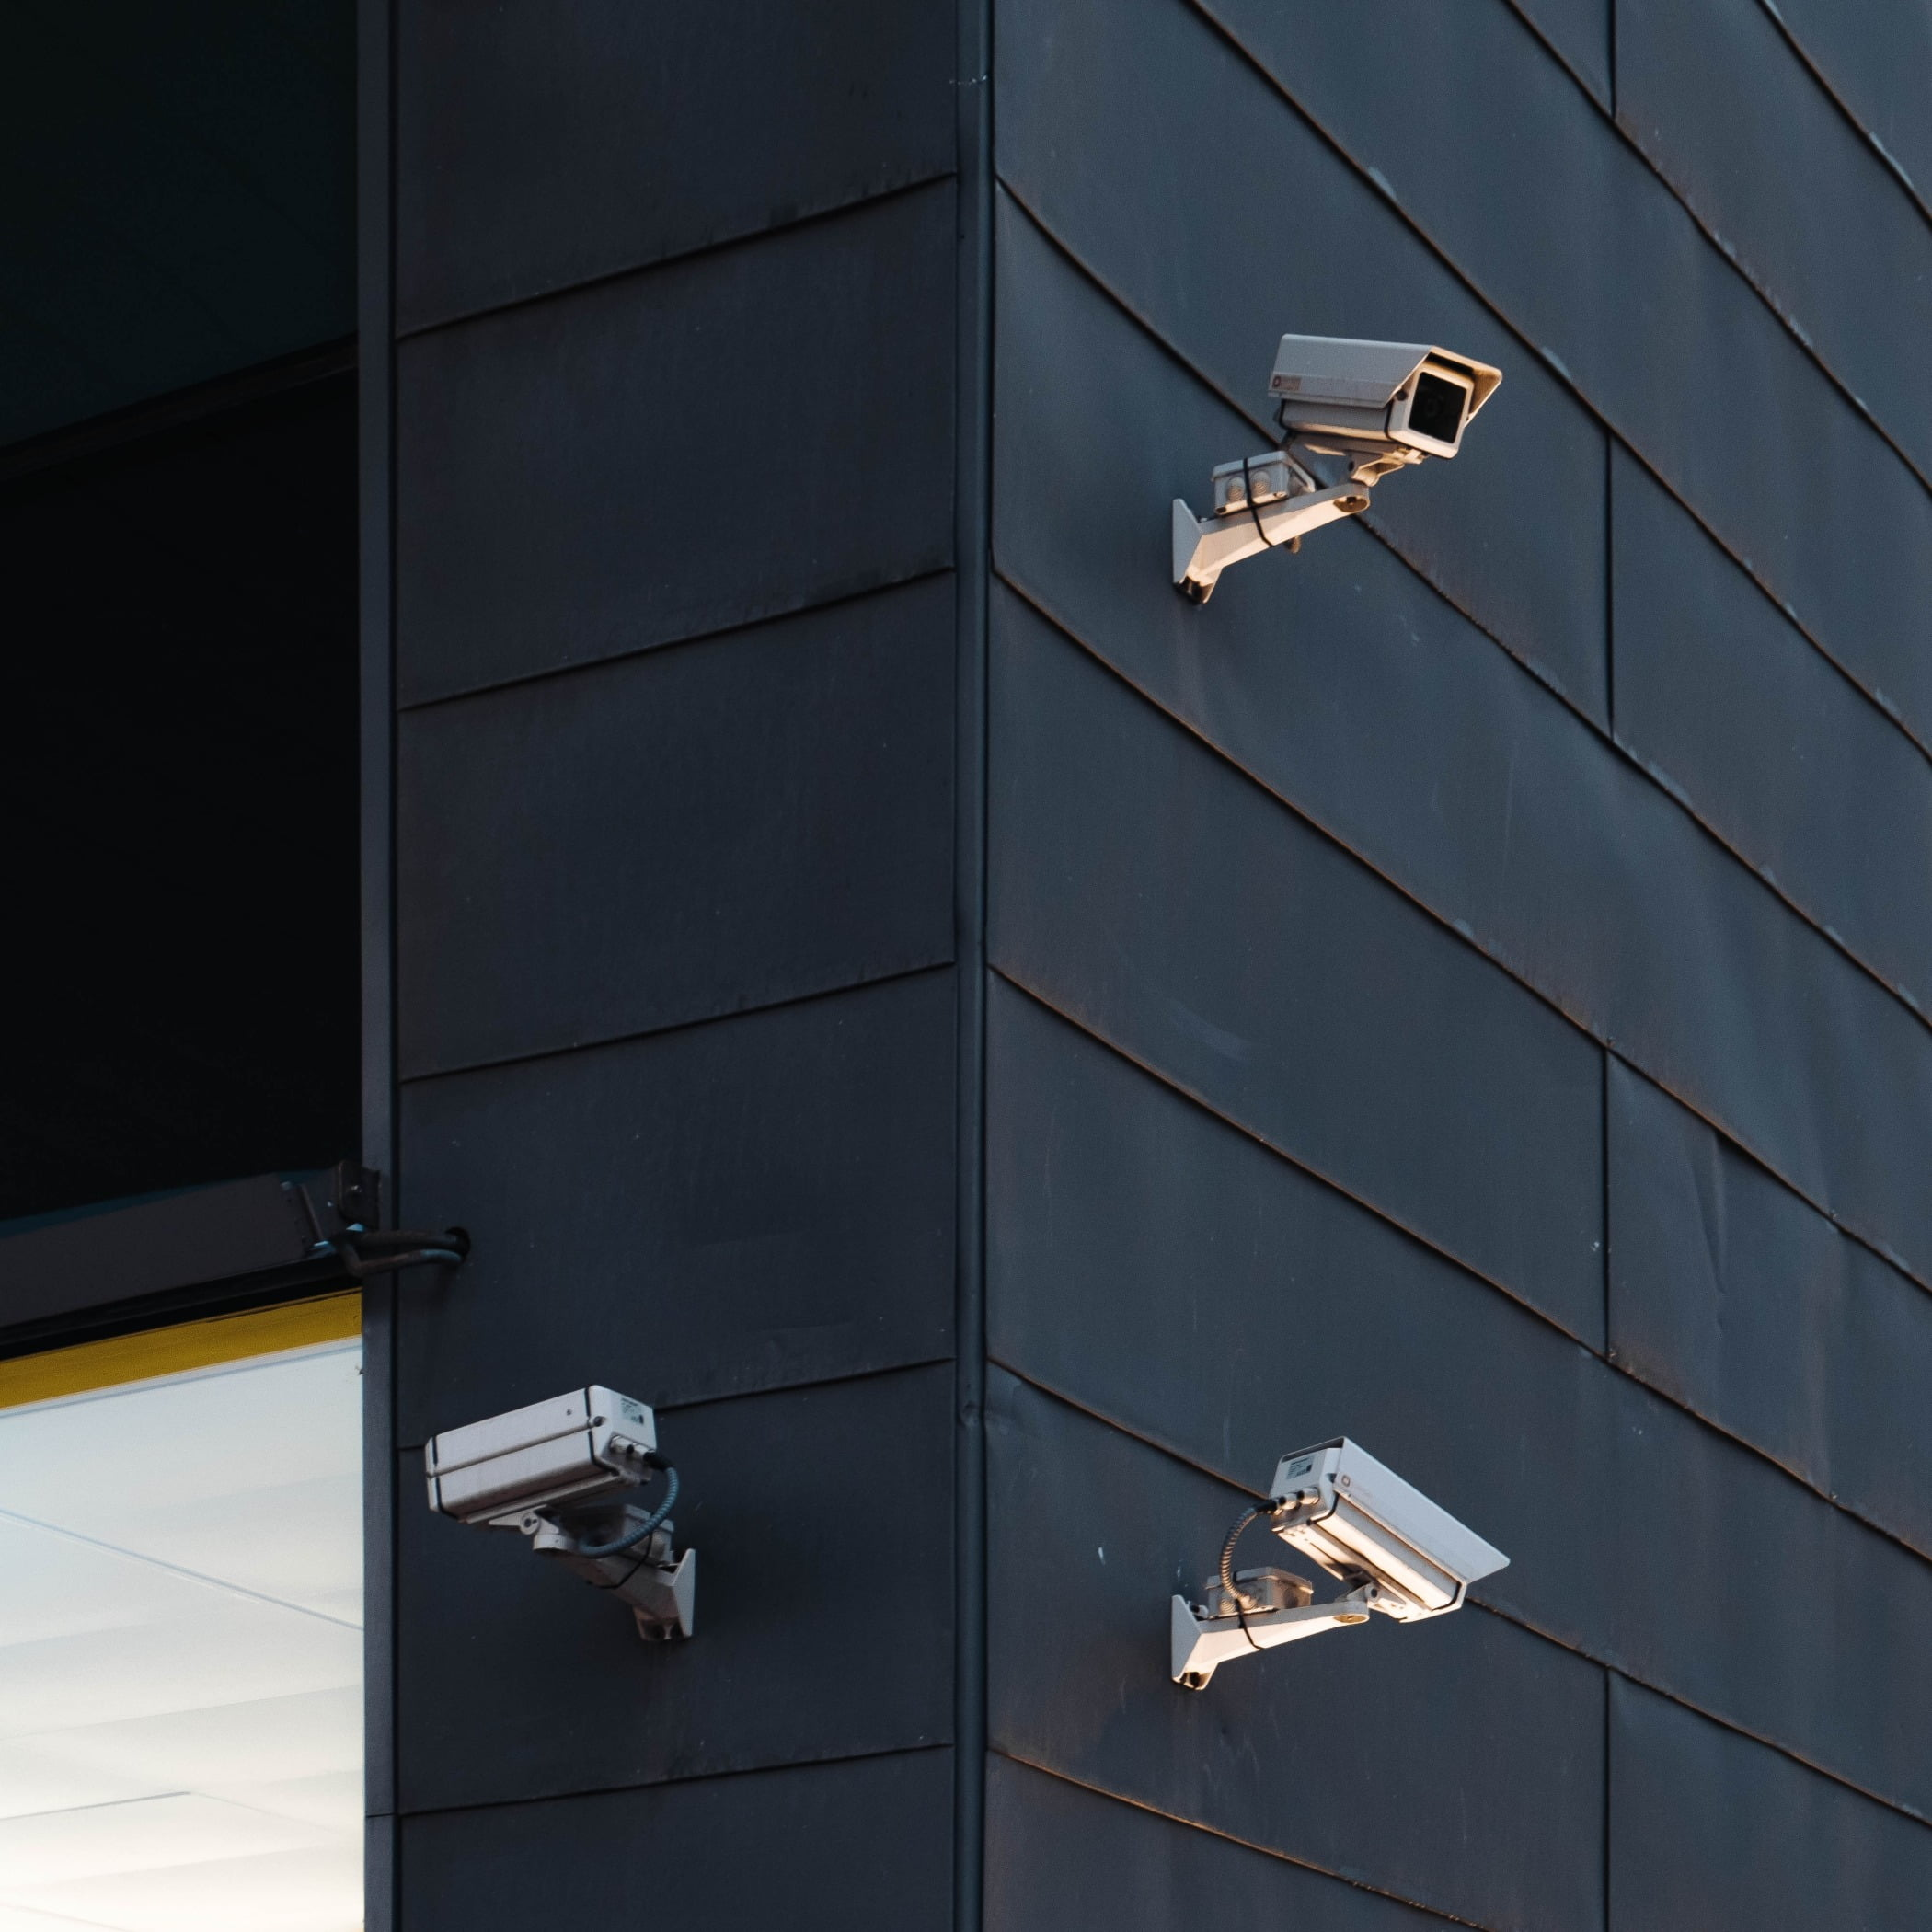 Surveillance cameras spotted at Barcelonas design museum.